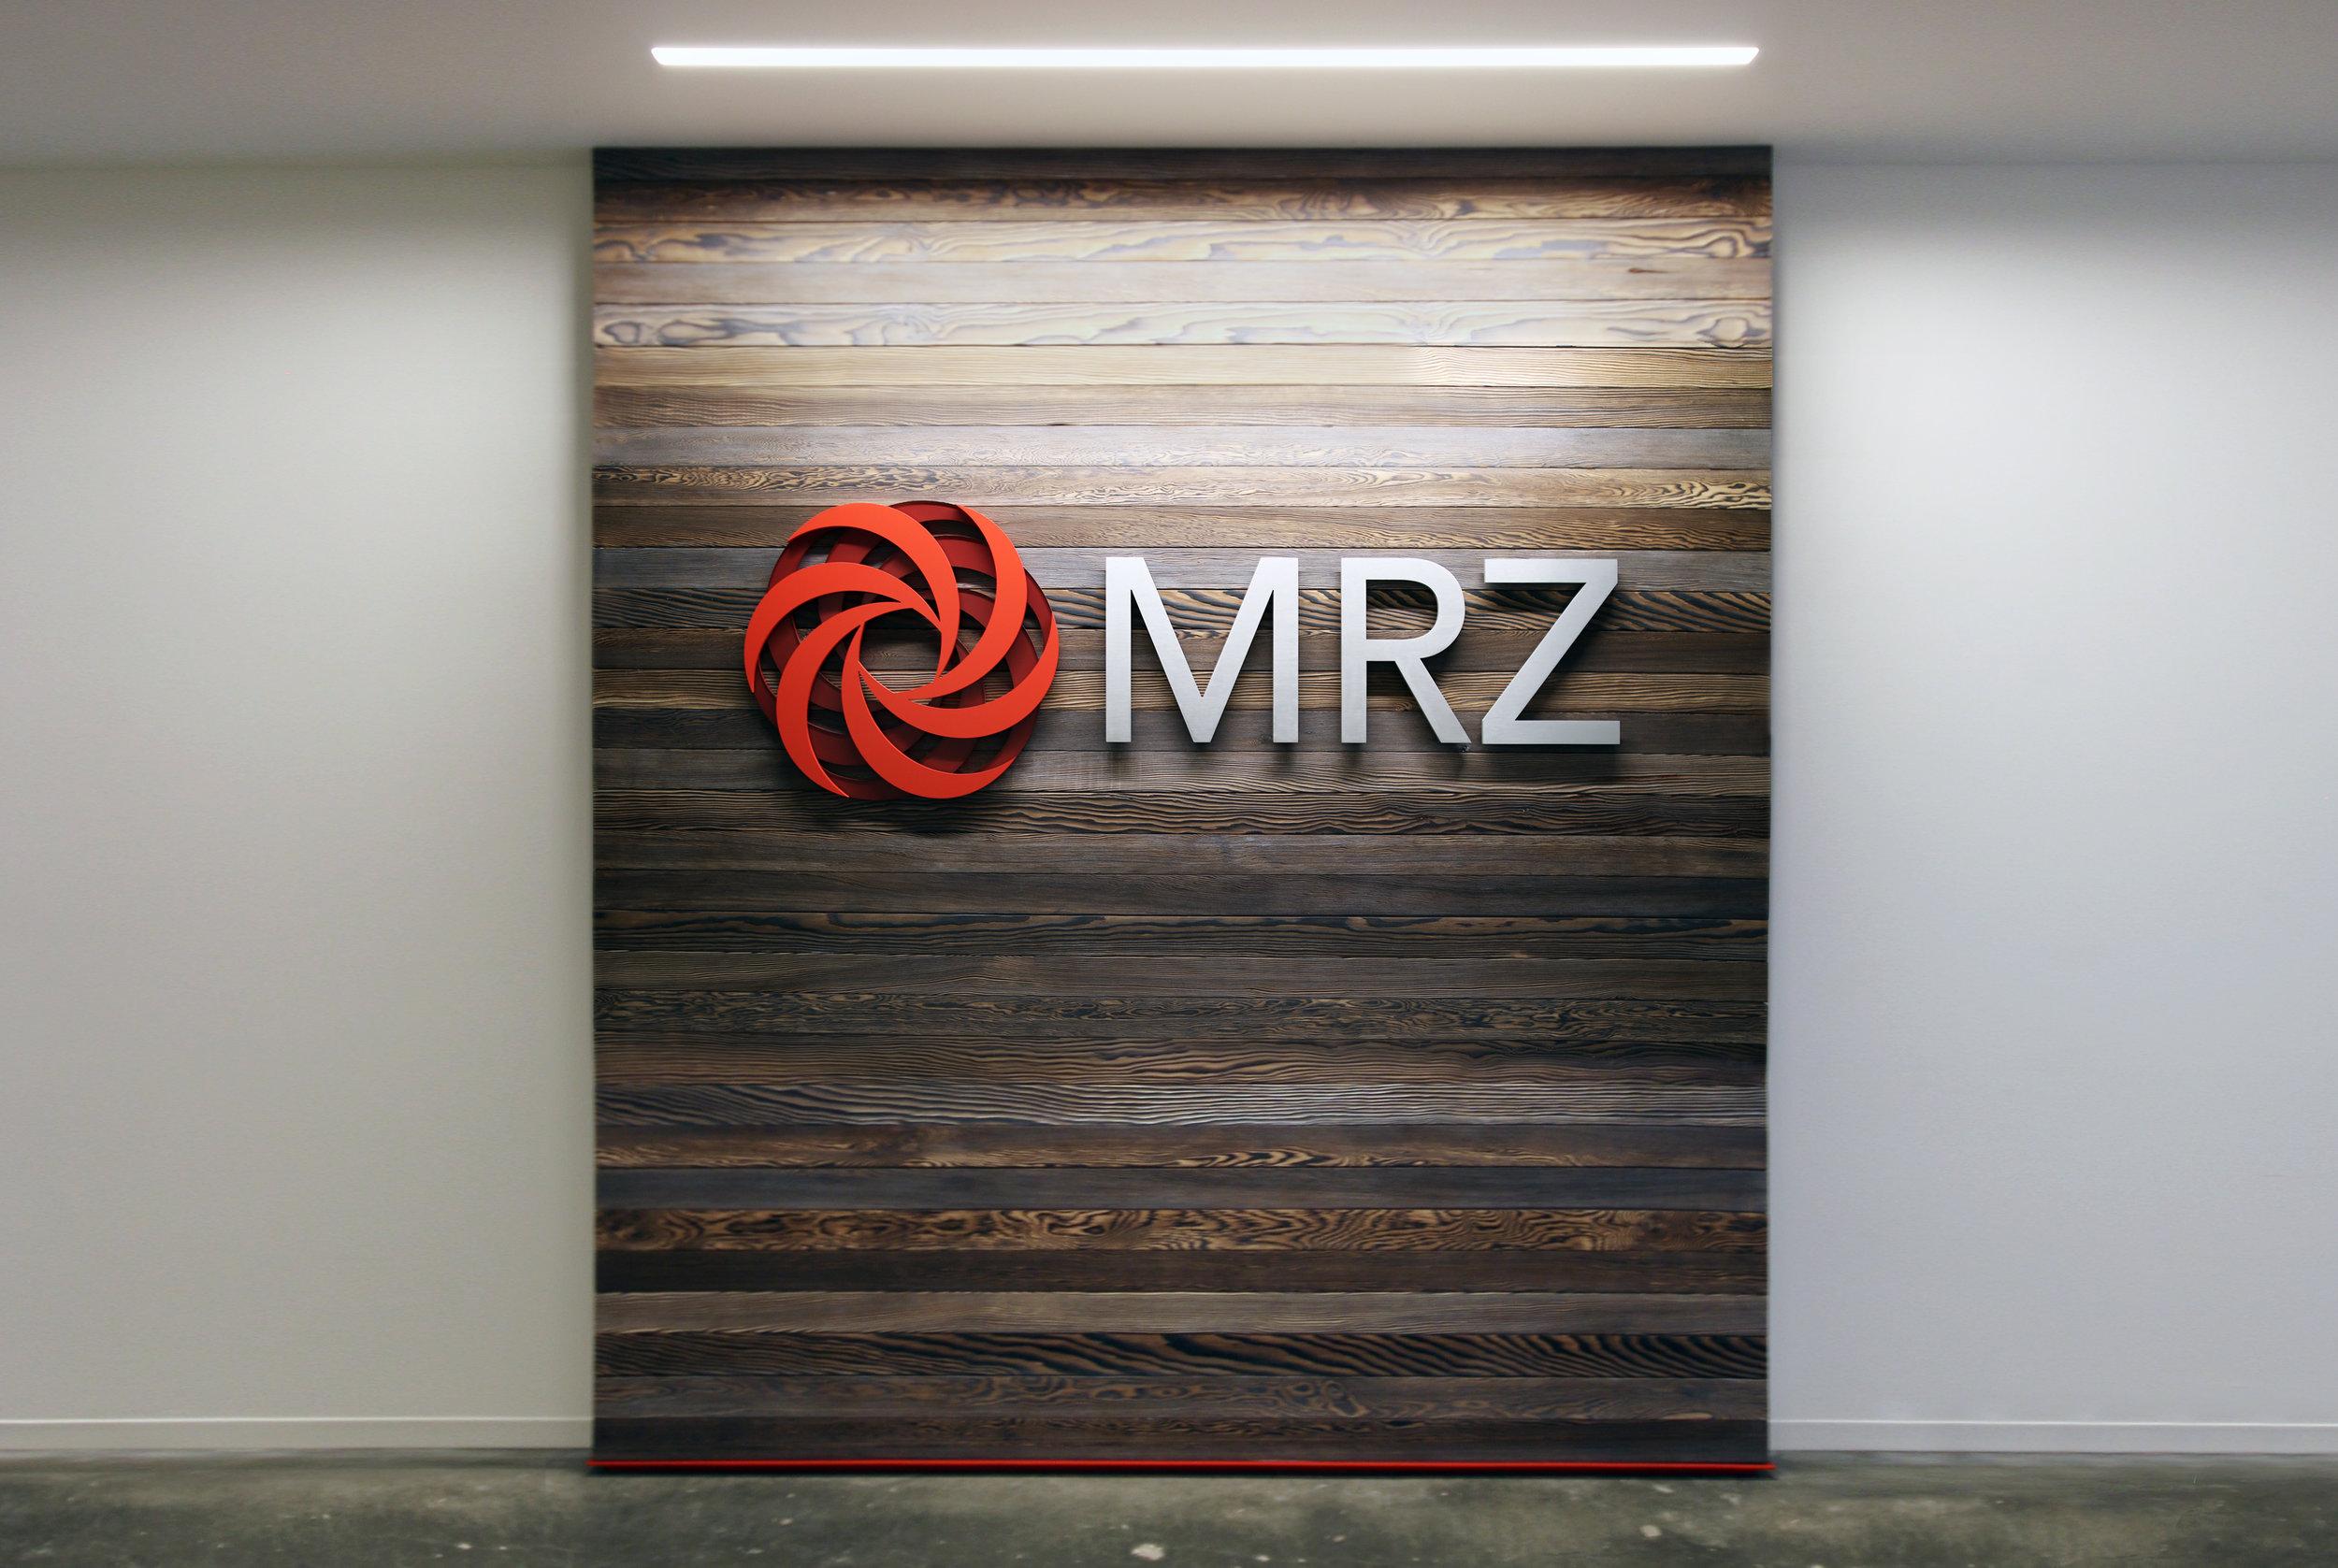 MRZ's Entry Point